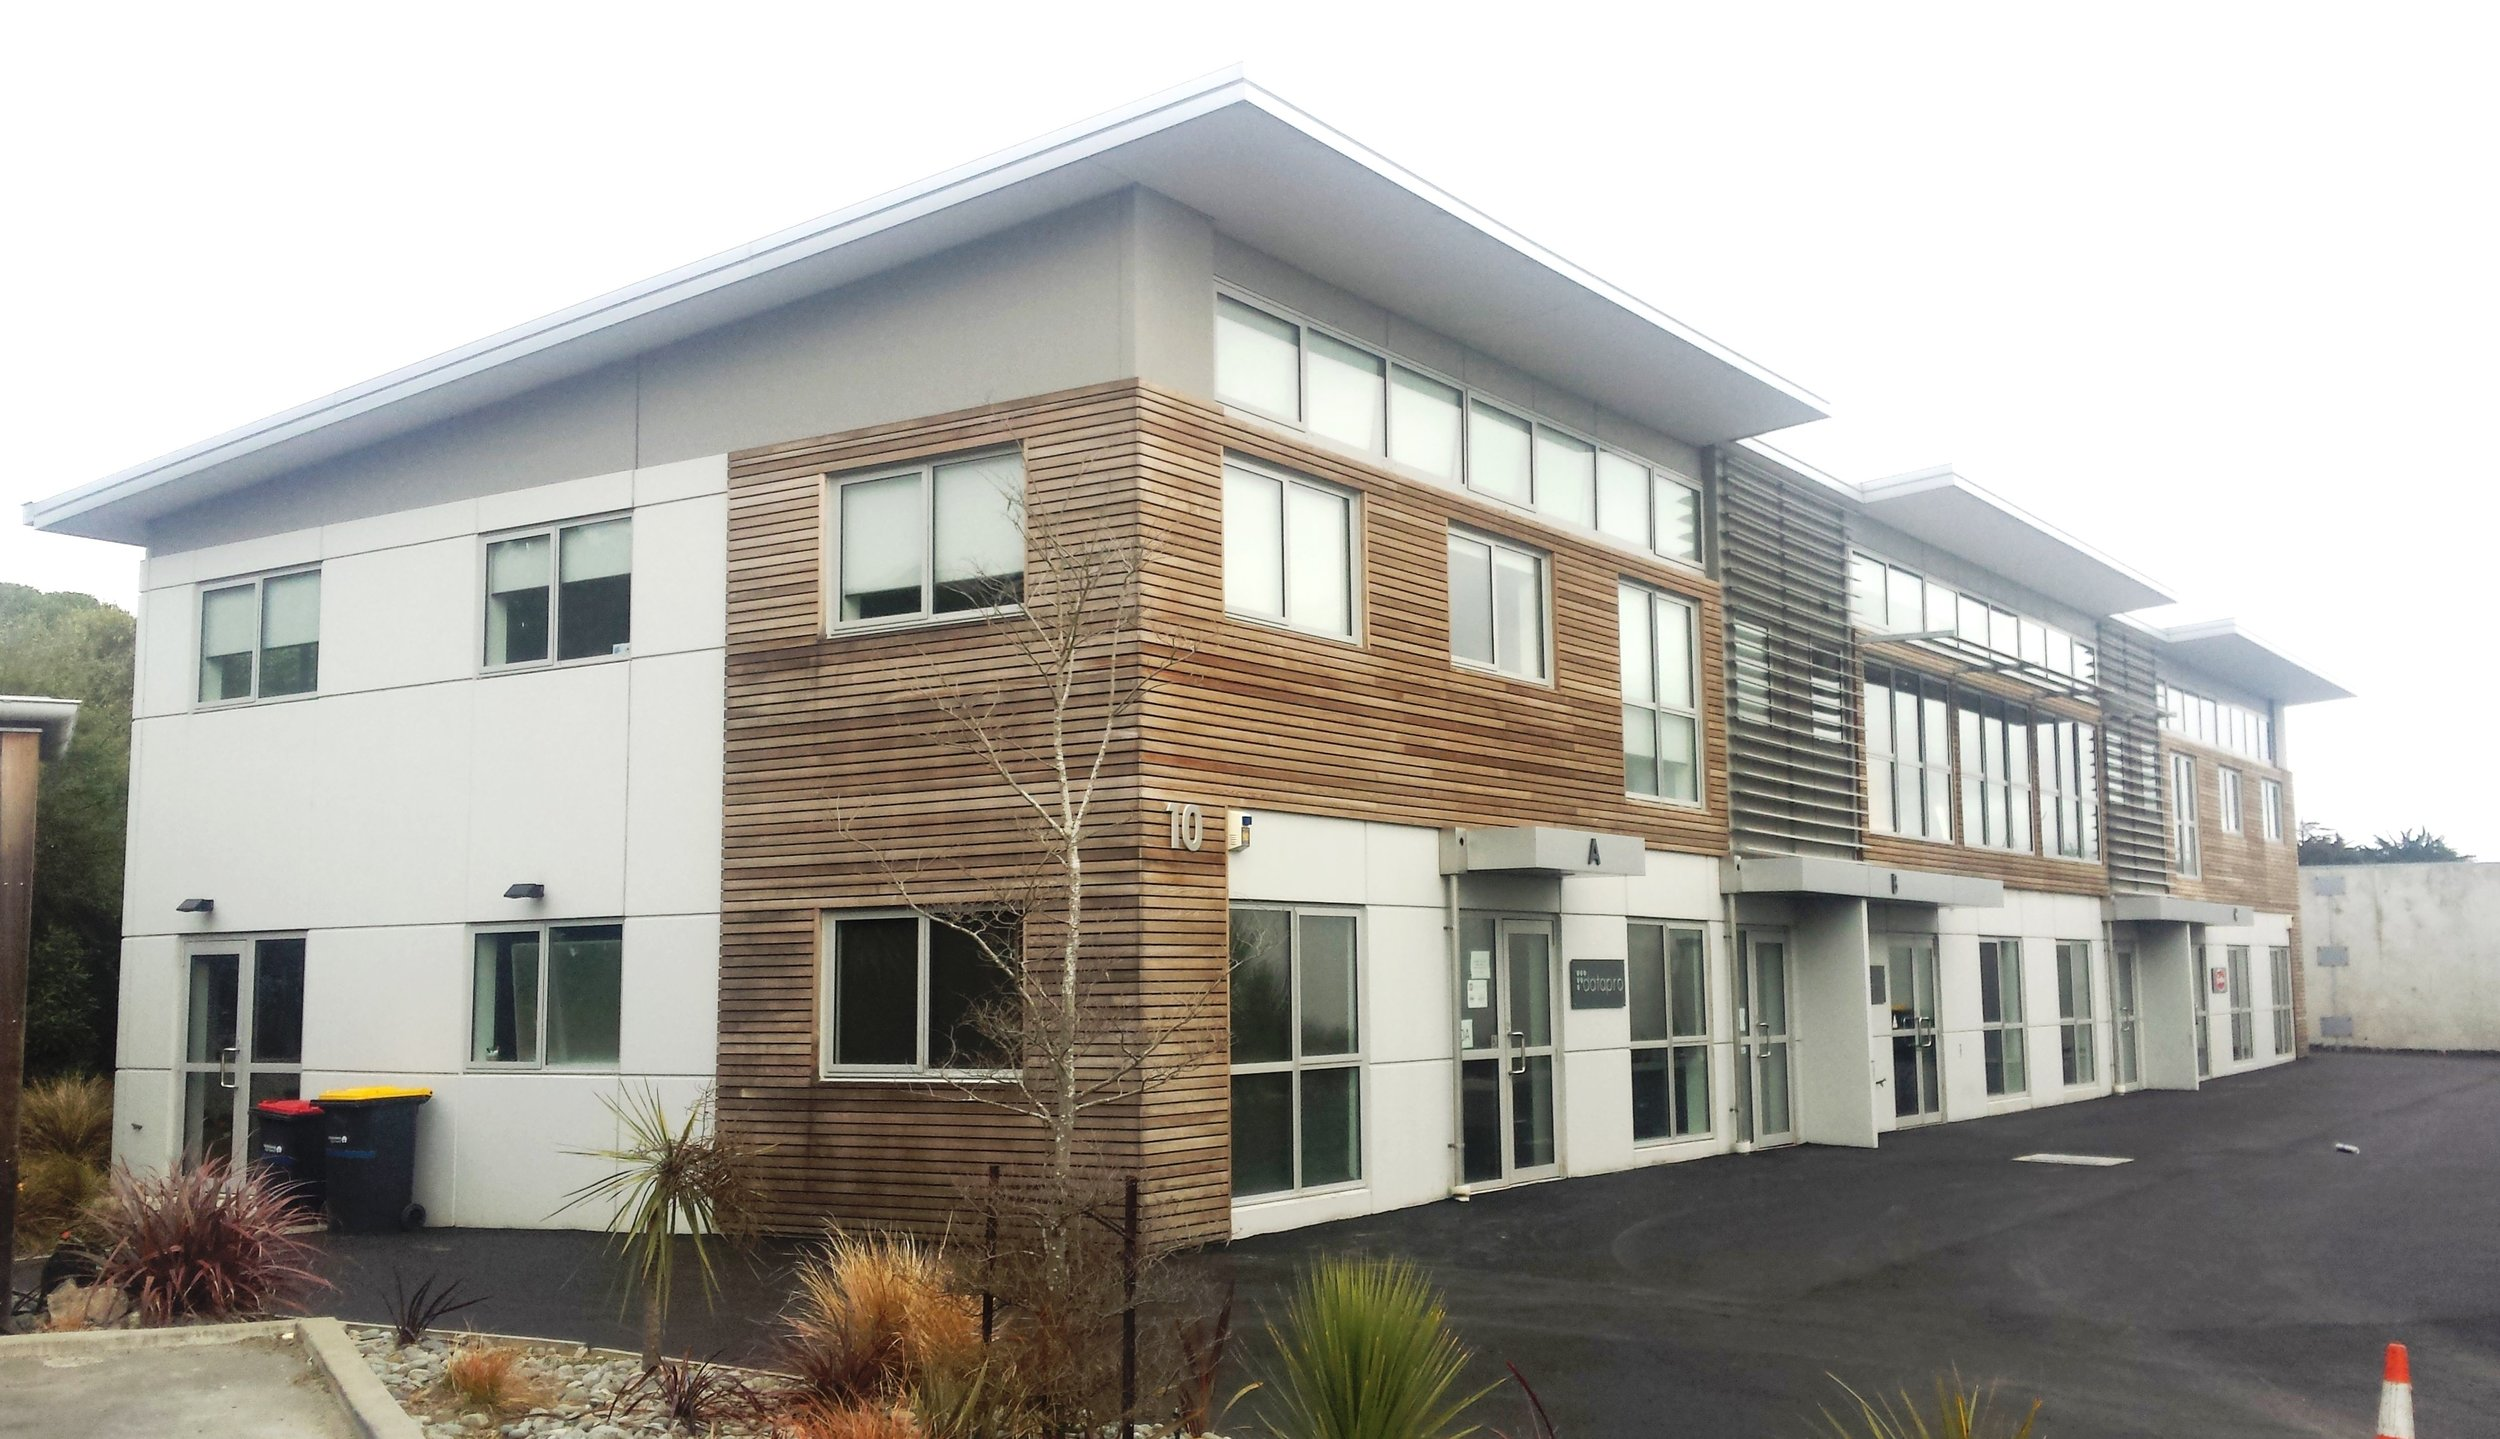 10 Tussock Lane Development, Ferrymead, Christchurch